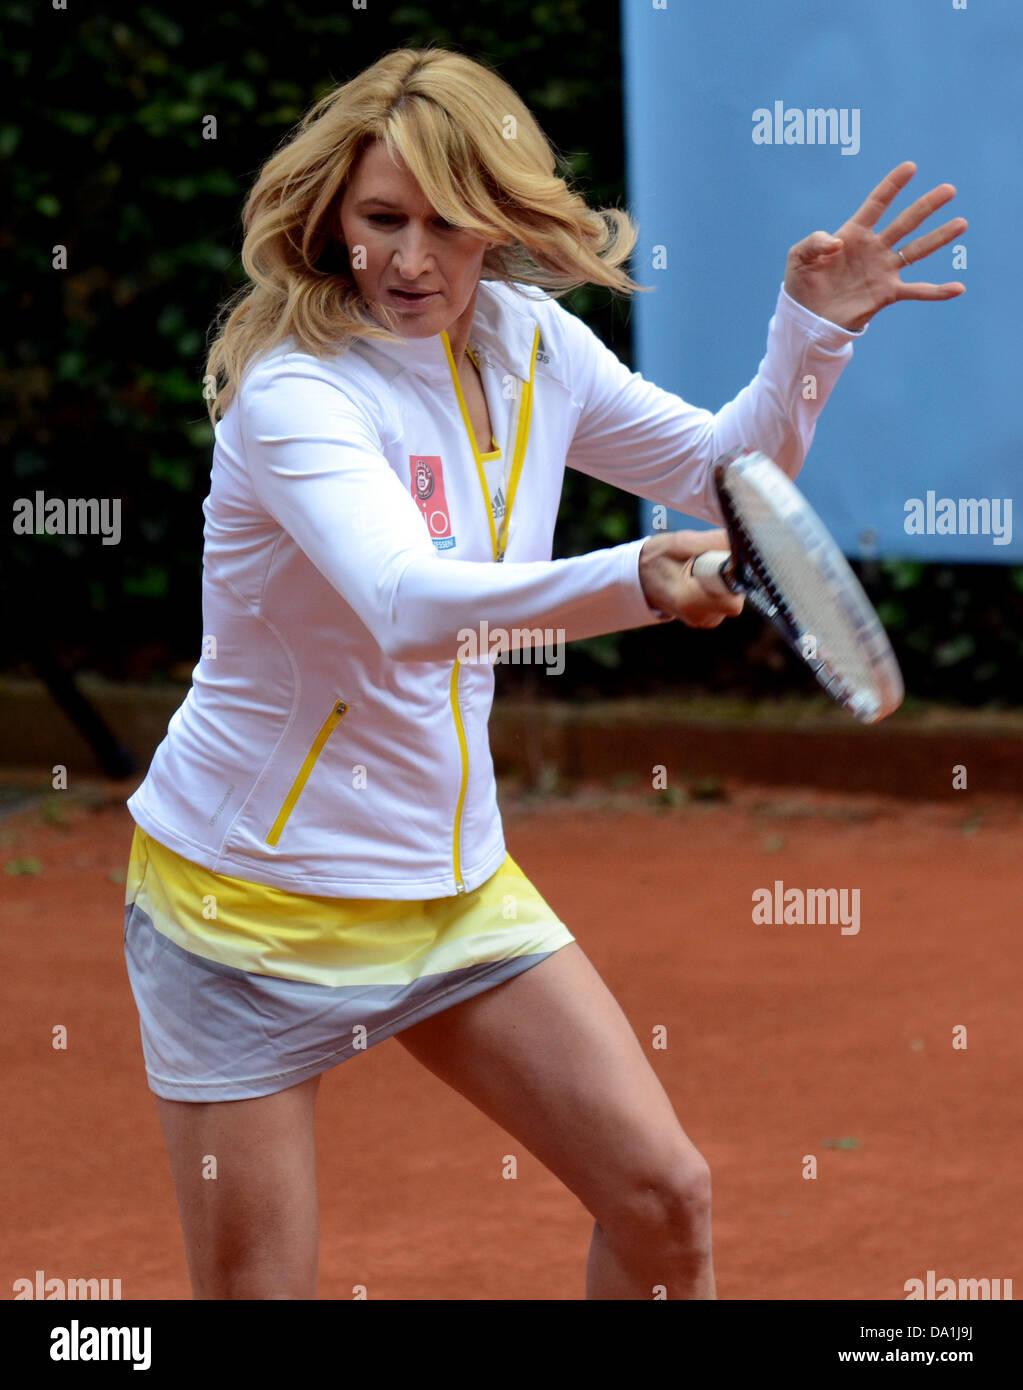 Former tennis player Steffi Graf plays tennis at Rochusclub in